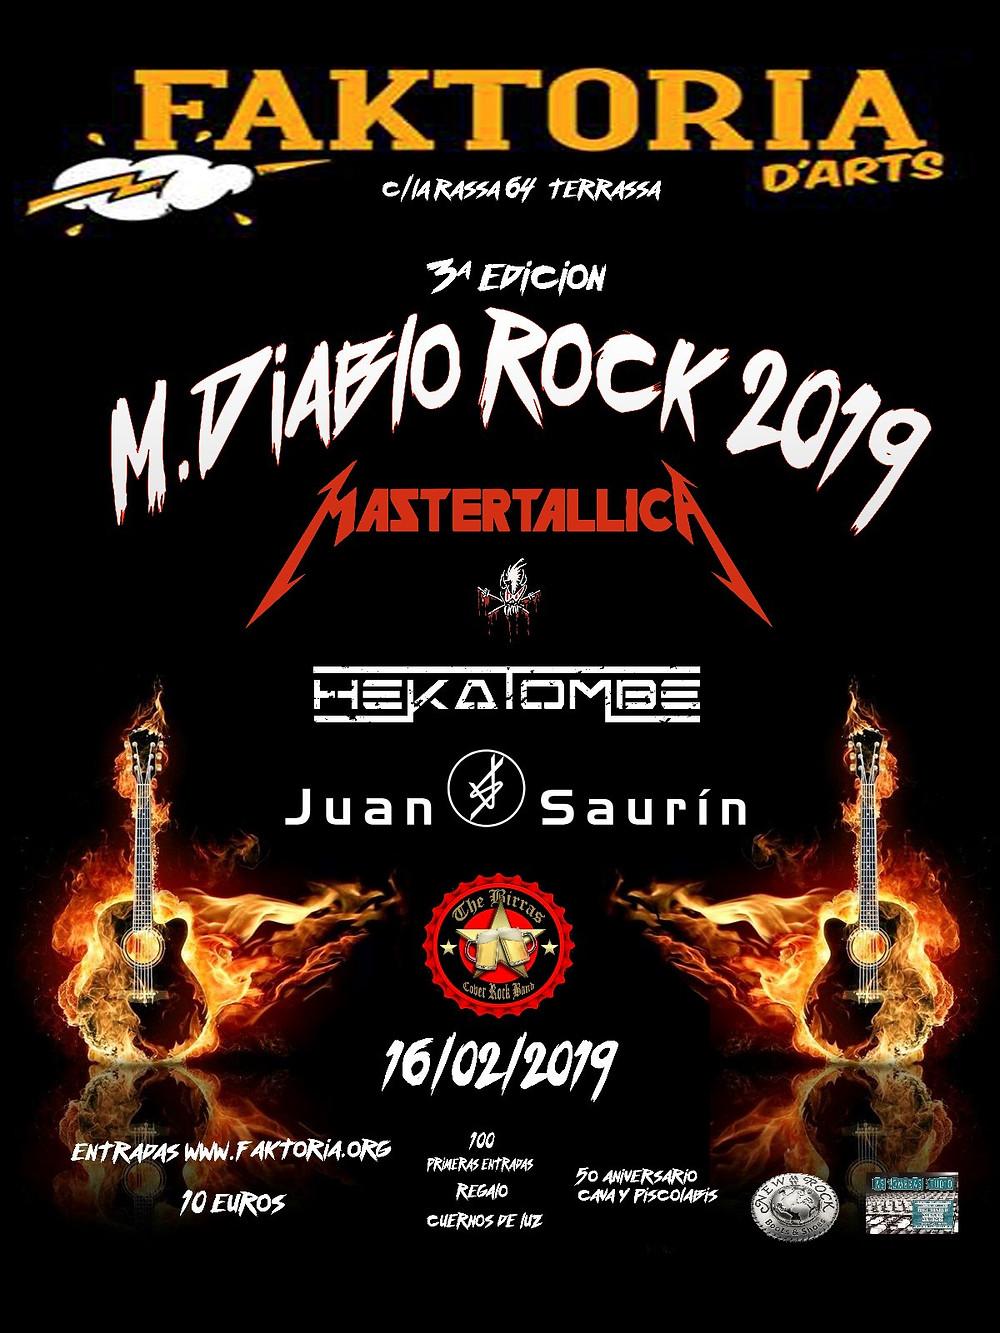 Diablo Rock 2019